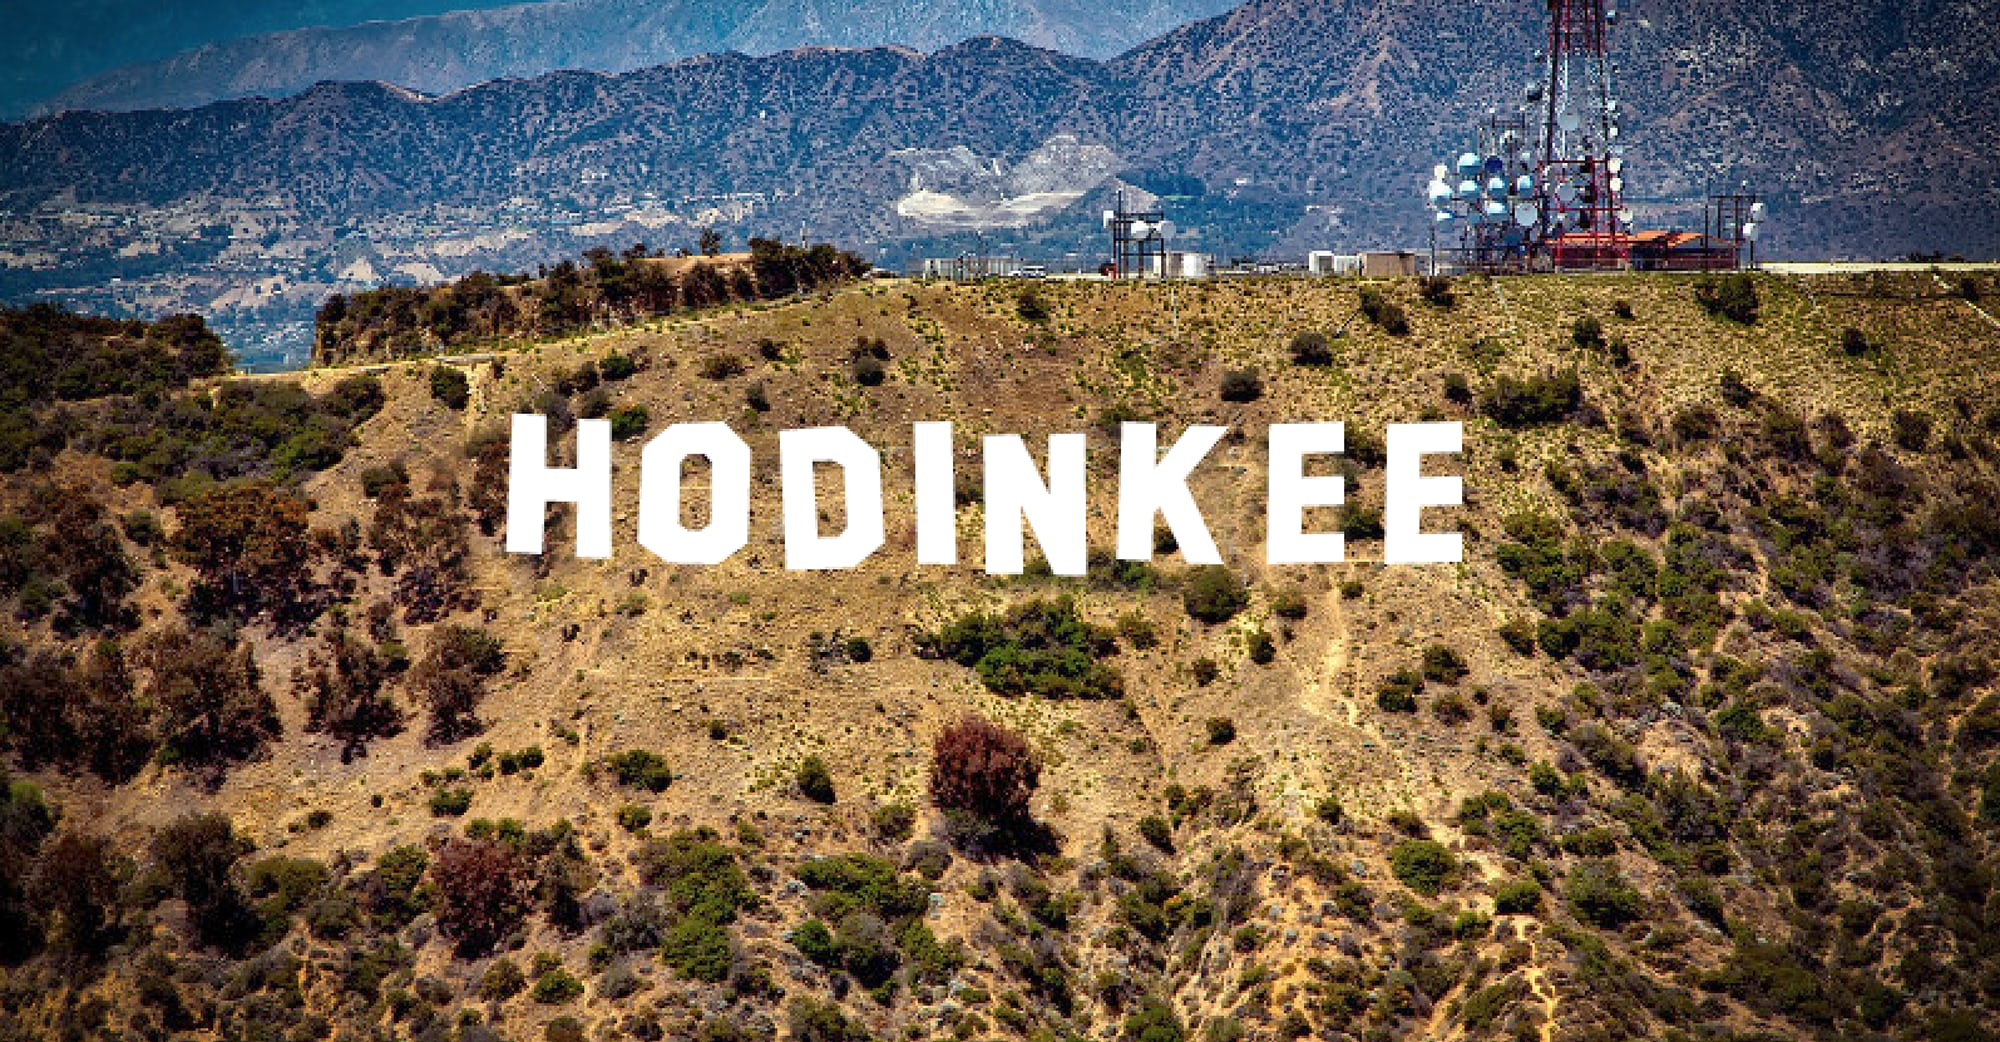 Image 1.png?ixlib=rails 1.1 Happenings: HODINKEE Meet-Up In L.A. Happenings: HODINKEE Meet-Up In L.A. image 1